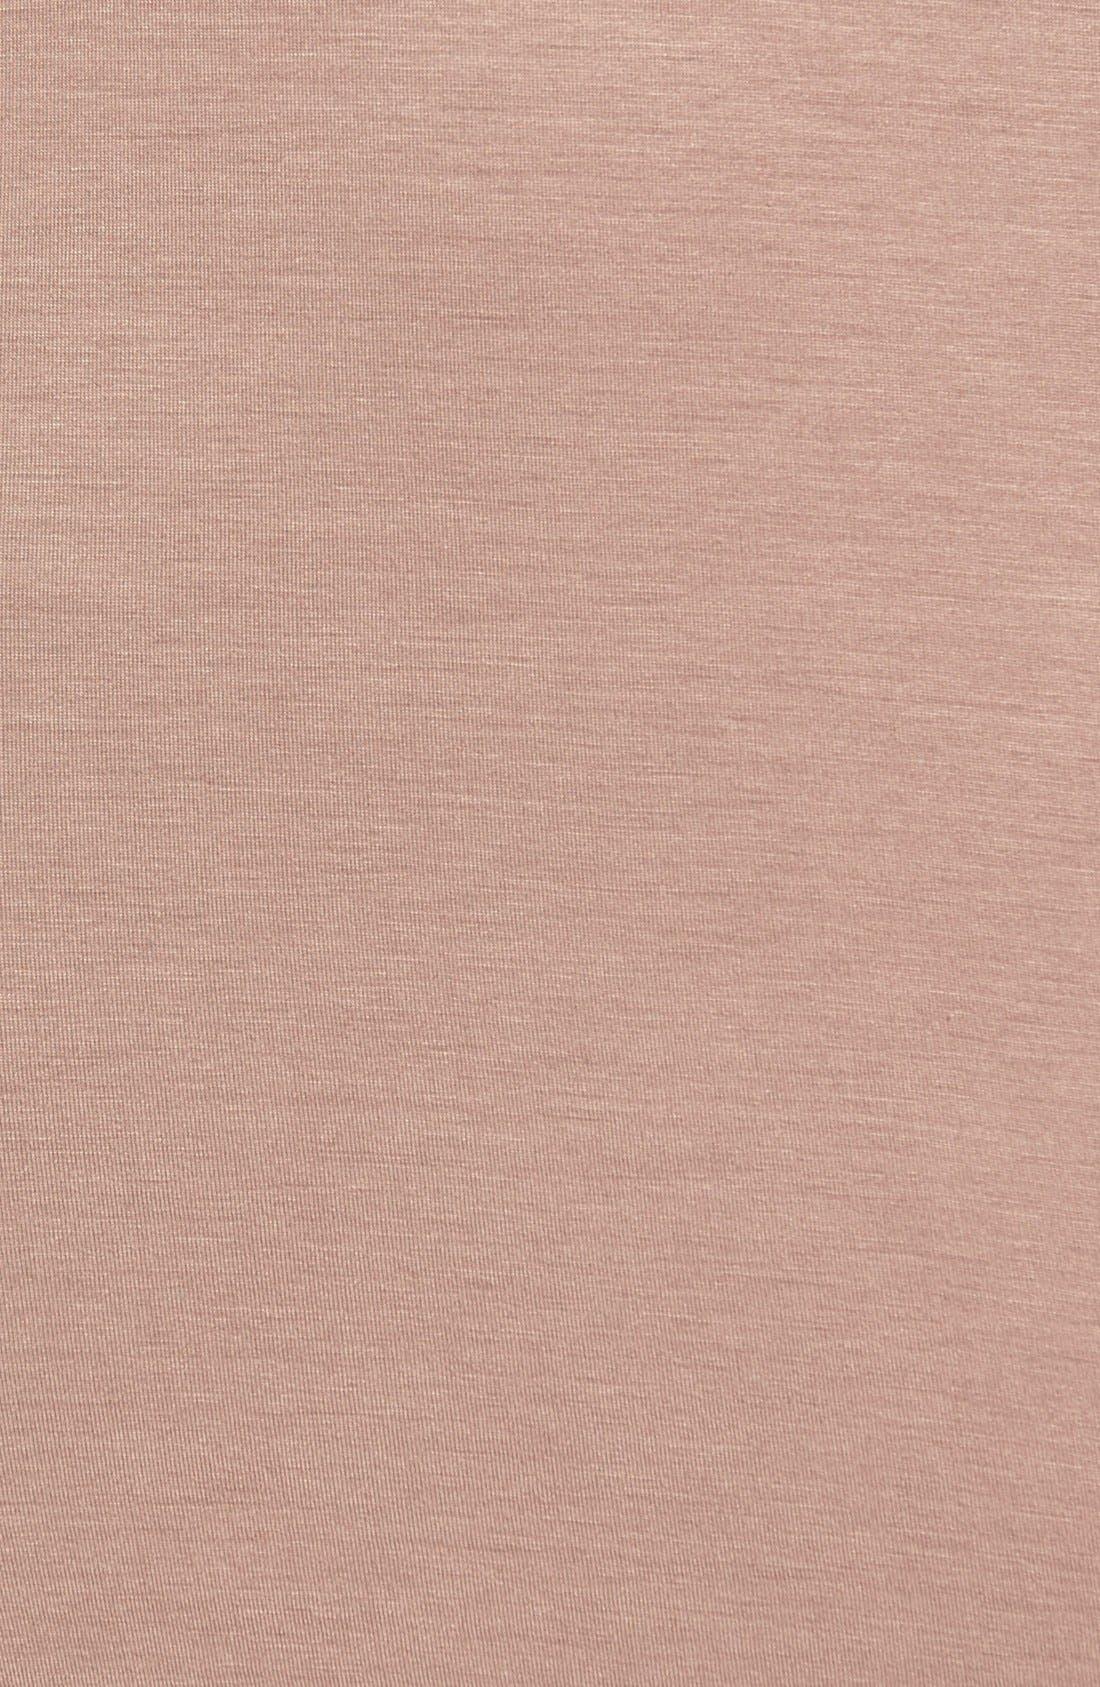 Cowl Neck Shift Dress,                             Alternate thumbnail 89, color,